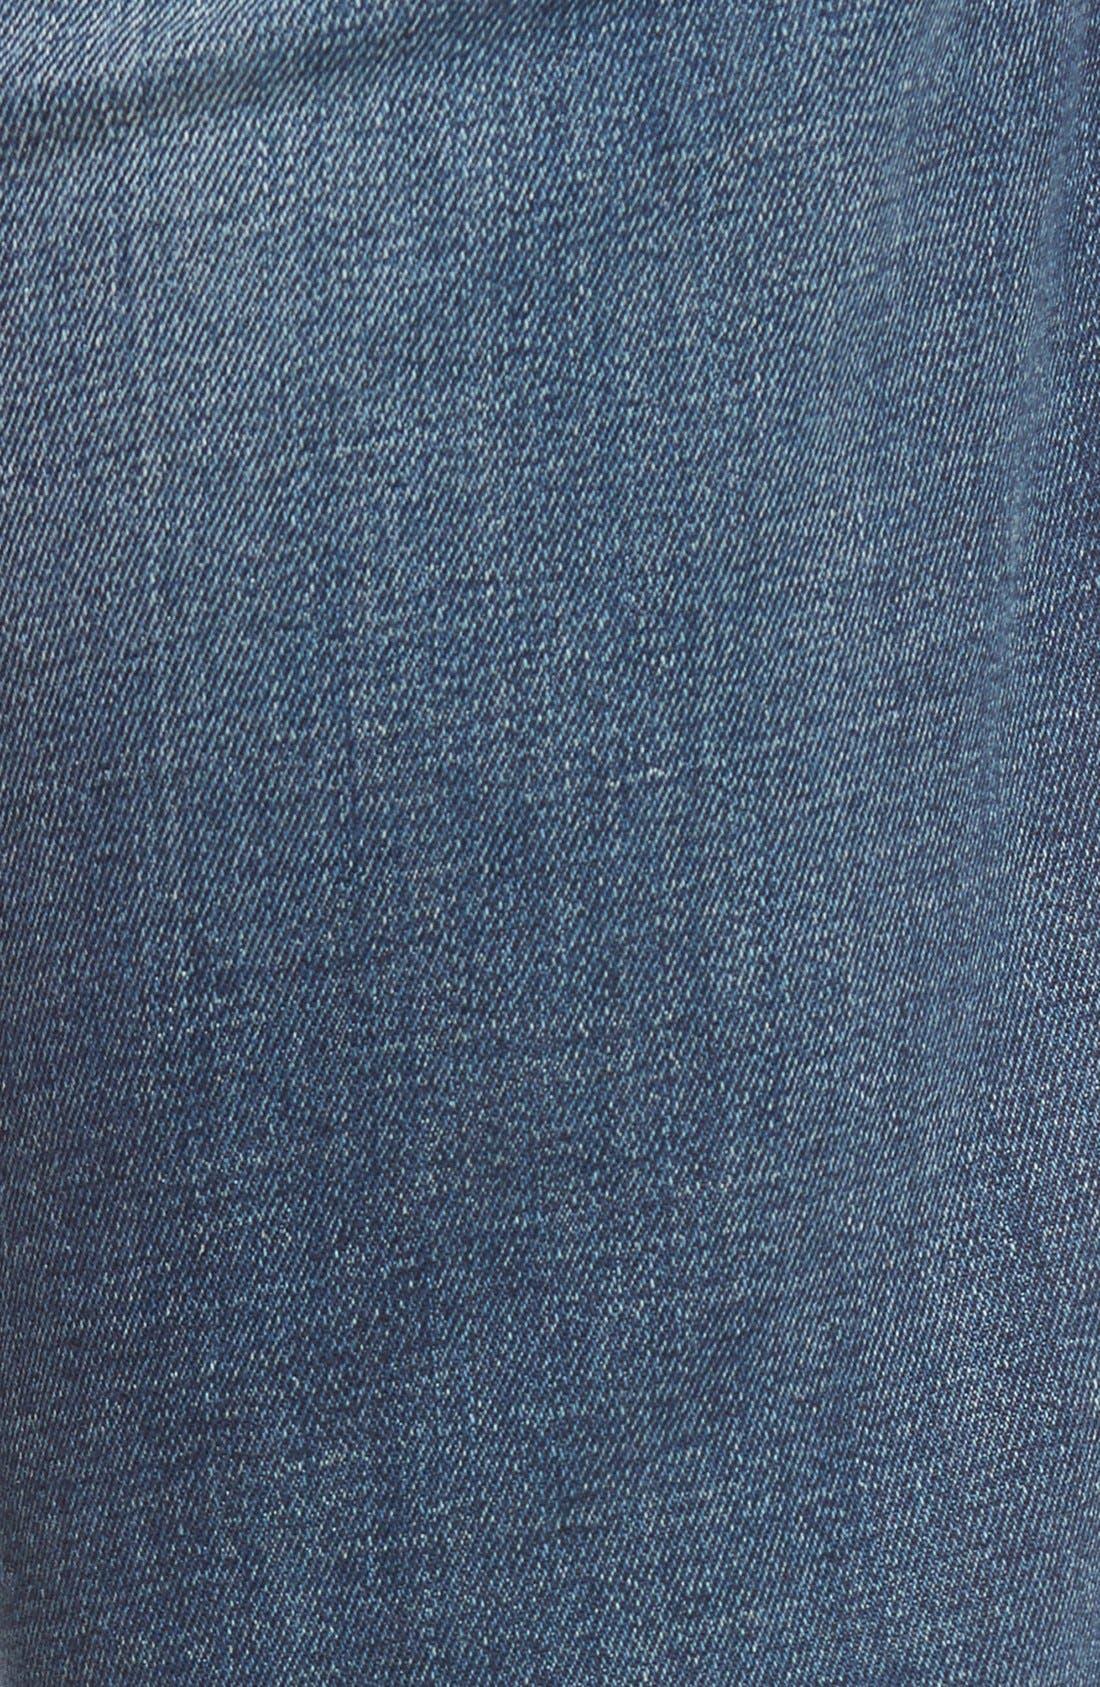 Zatiny Bootcut Jeans,                             Alternate thumbnail 5, color,                             857N